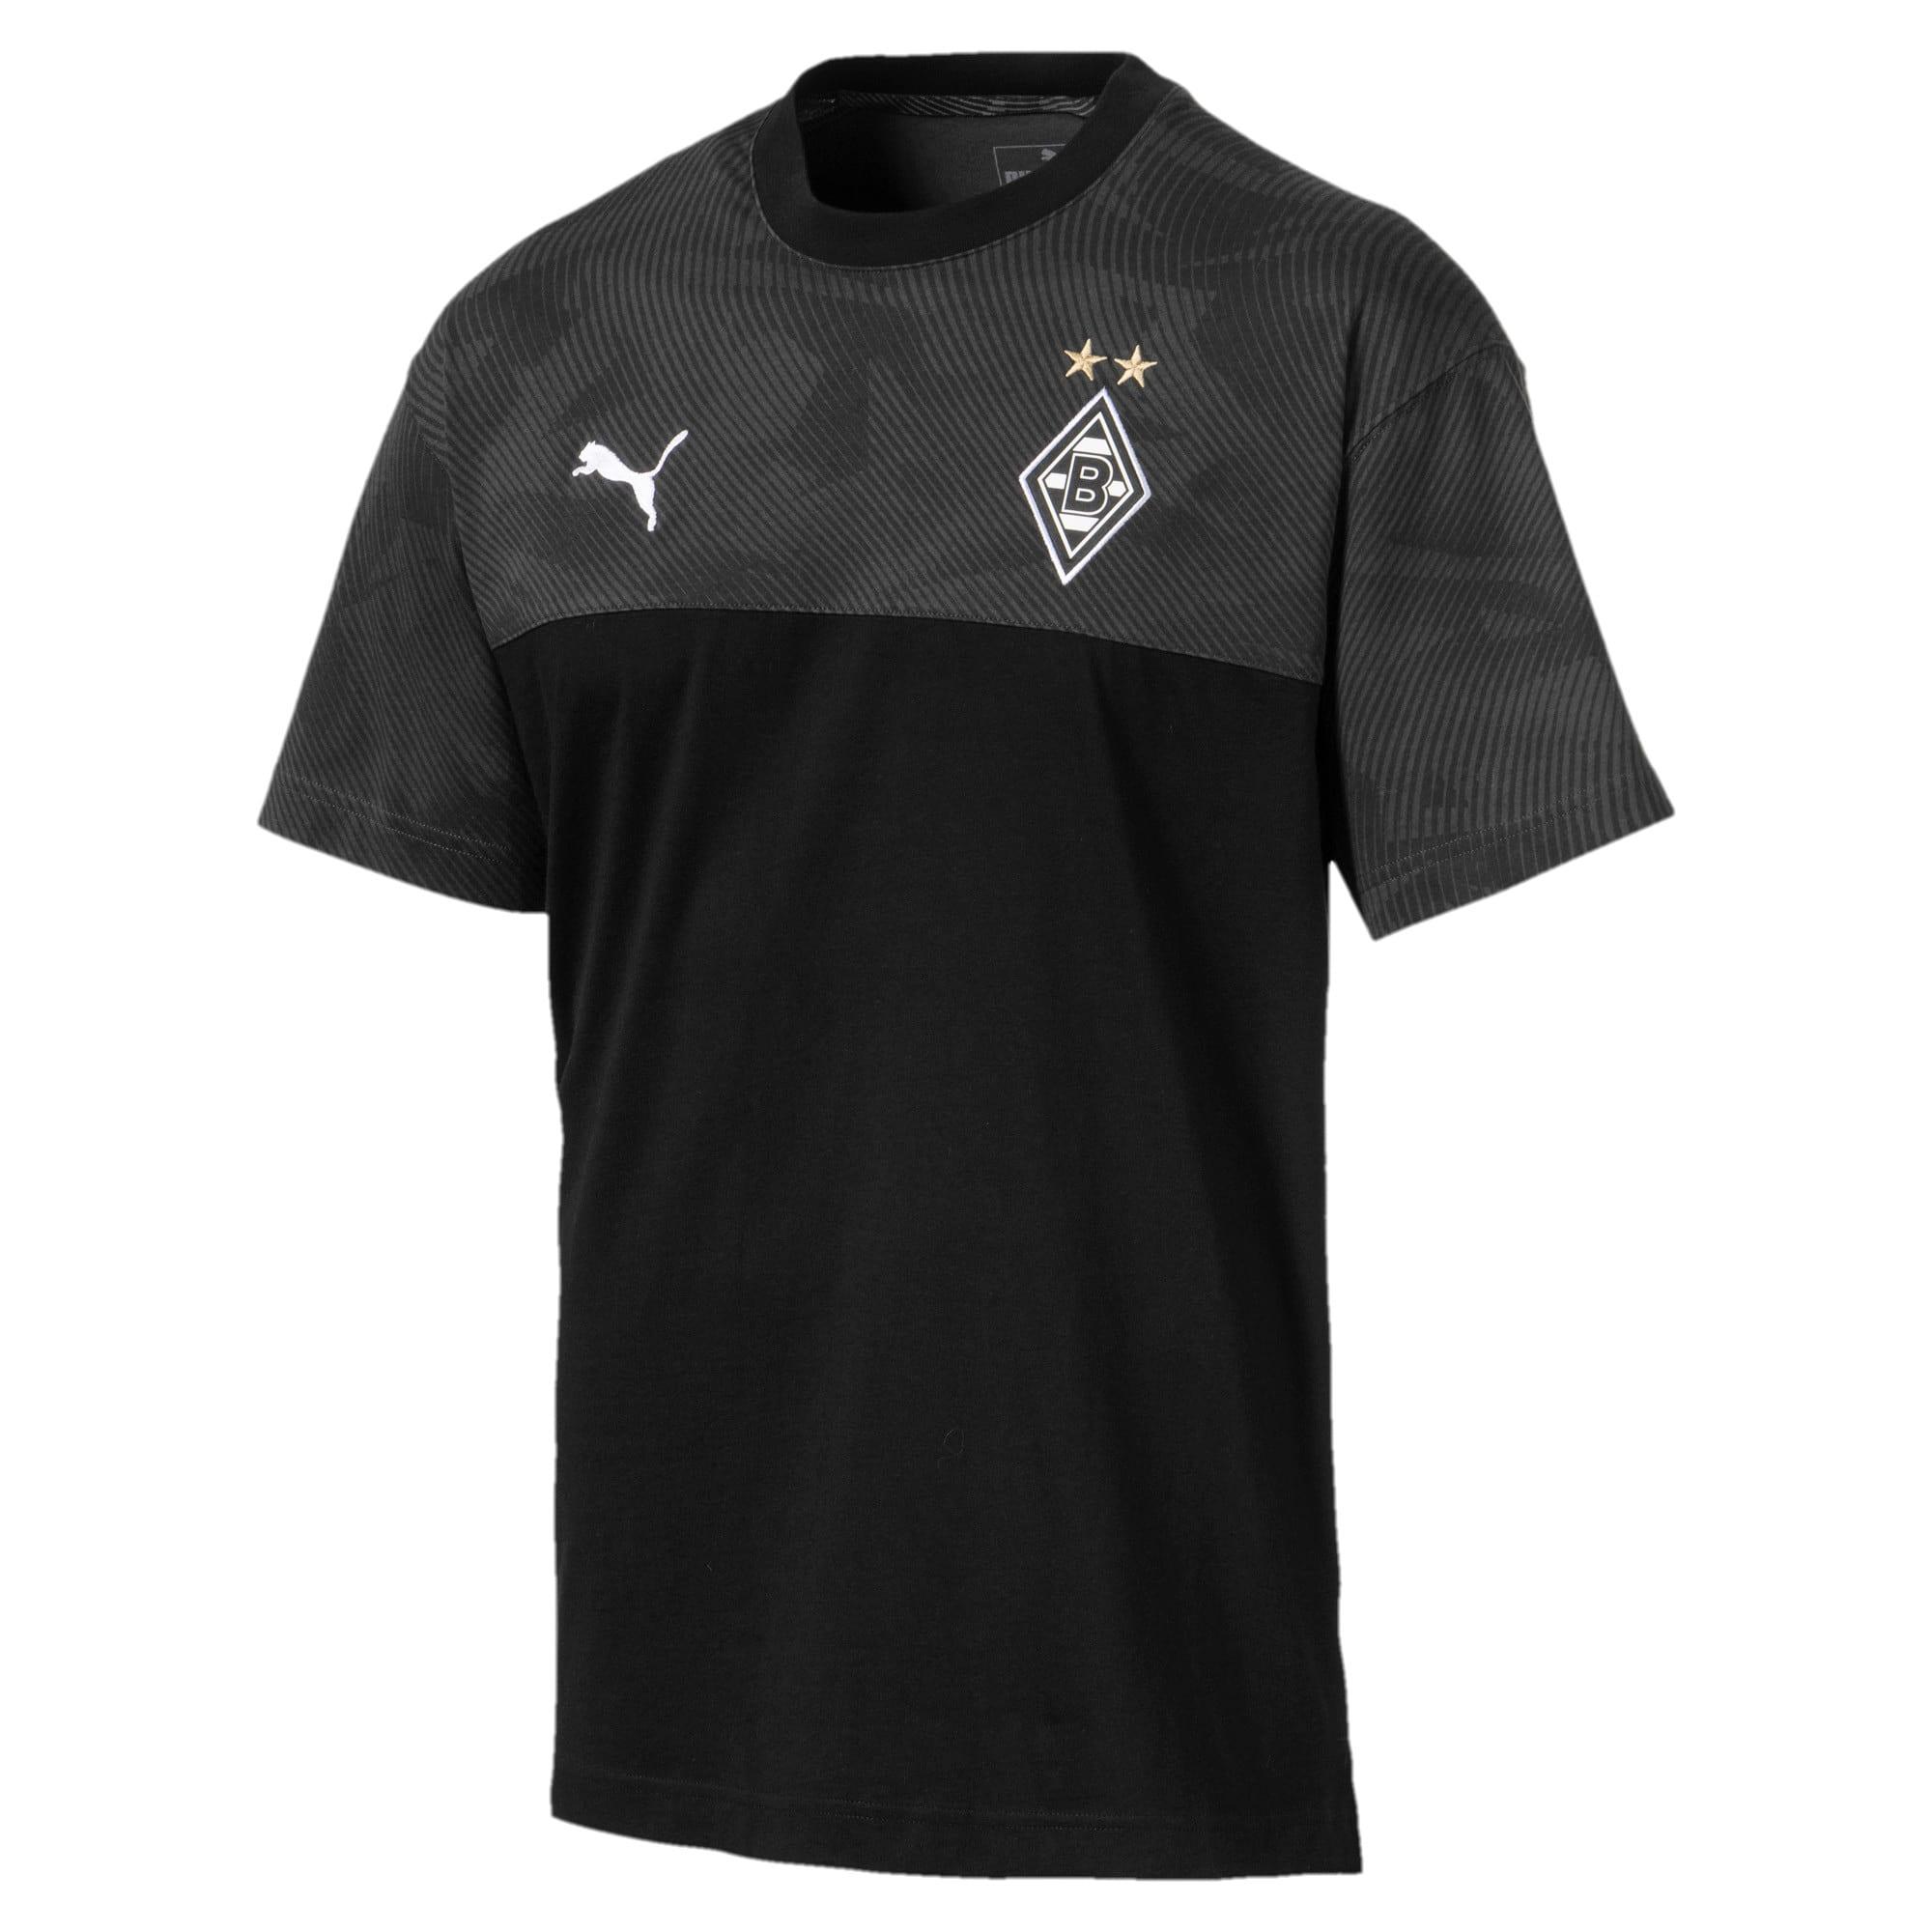 Thumbnail 4 of Borussia Mönchengladbach Casuals Men's Tee, Puma Black-Phantom Black, medium